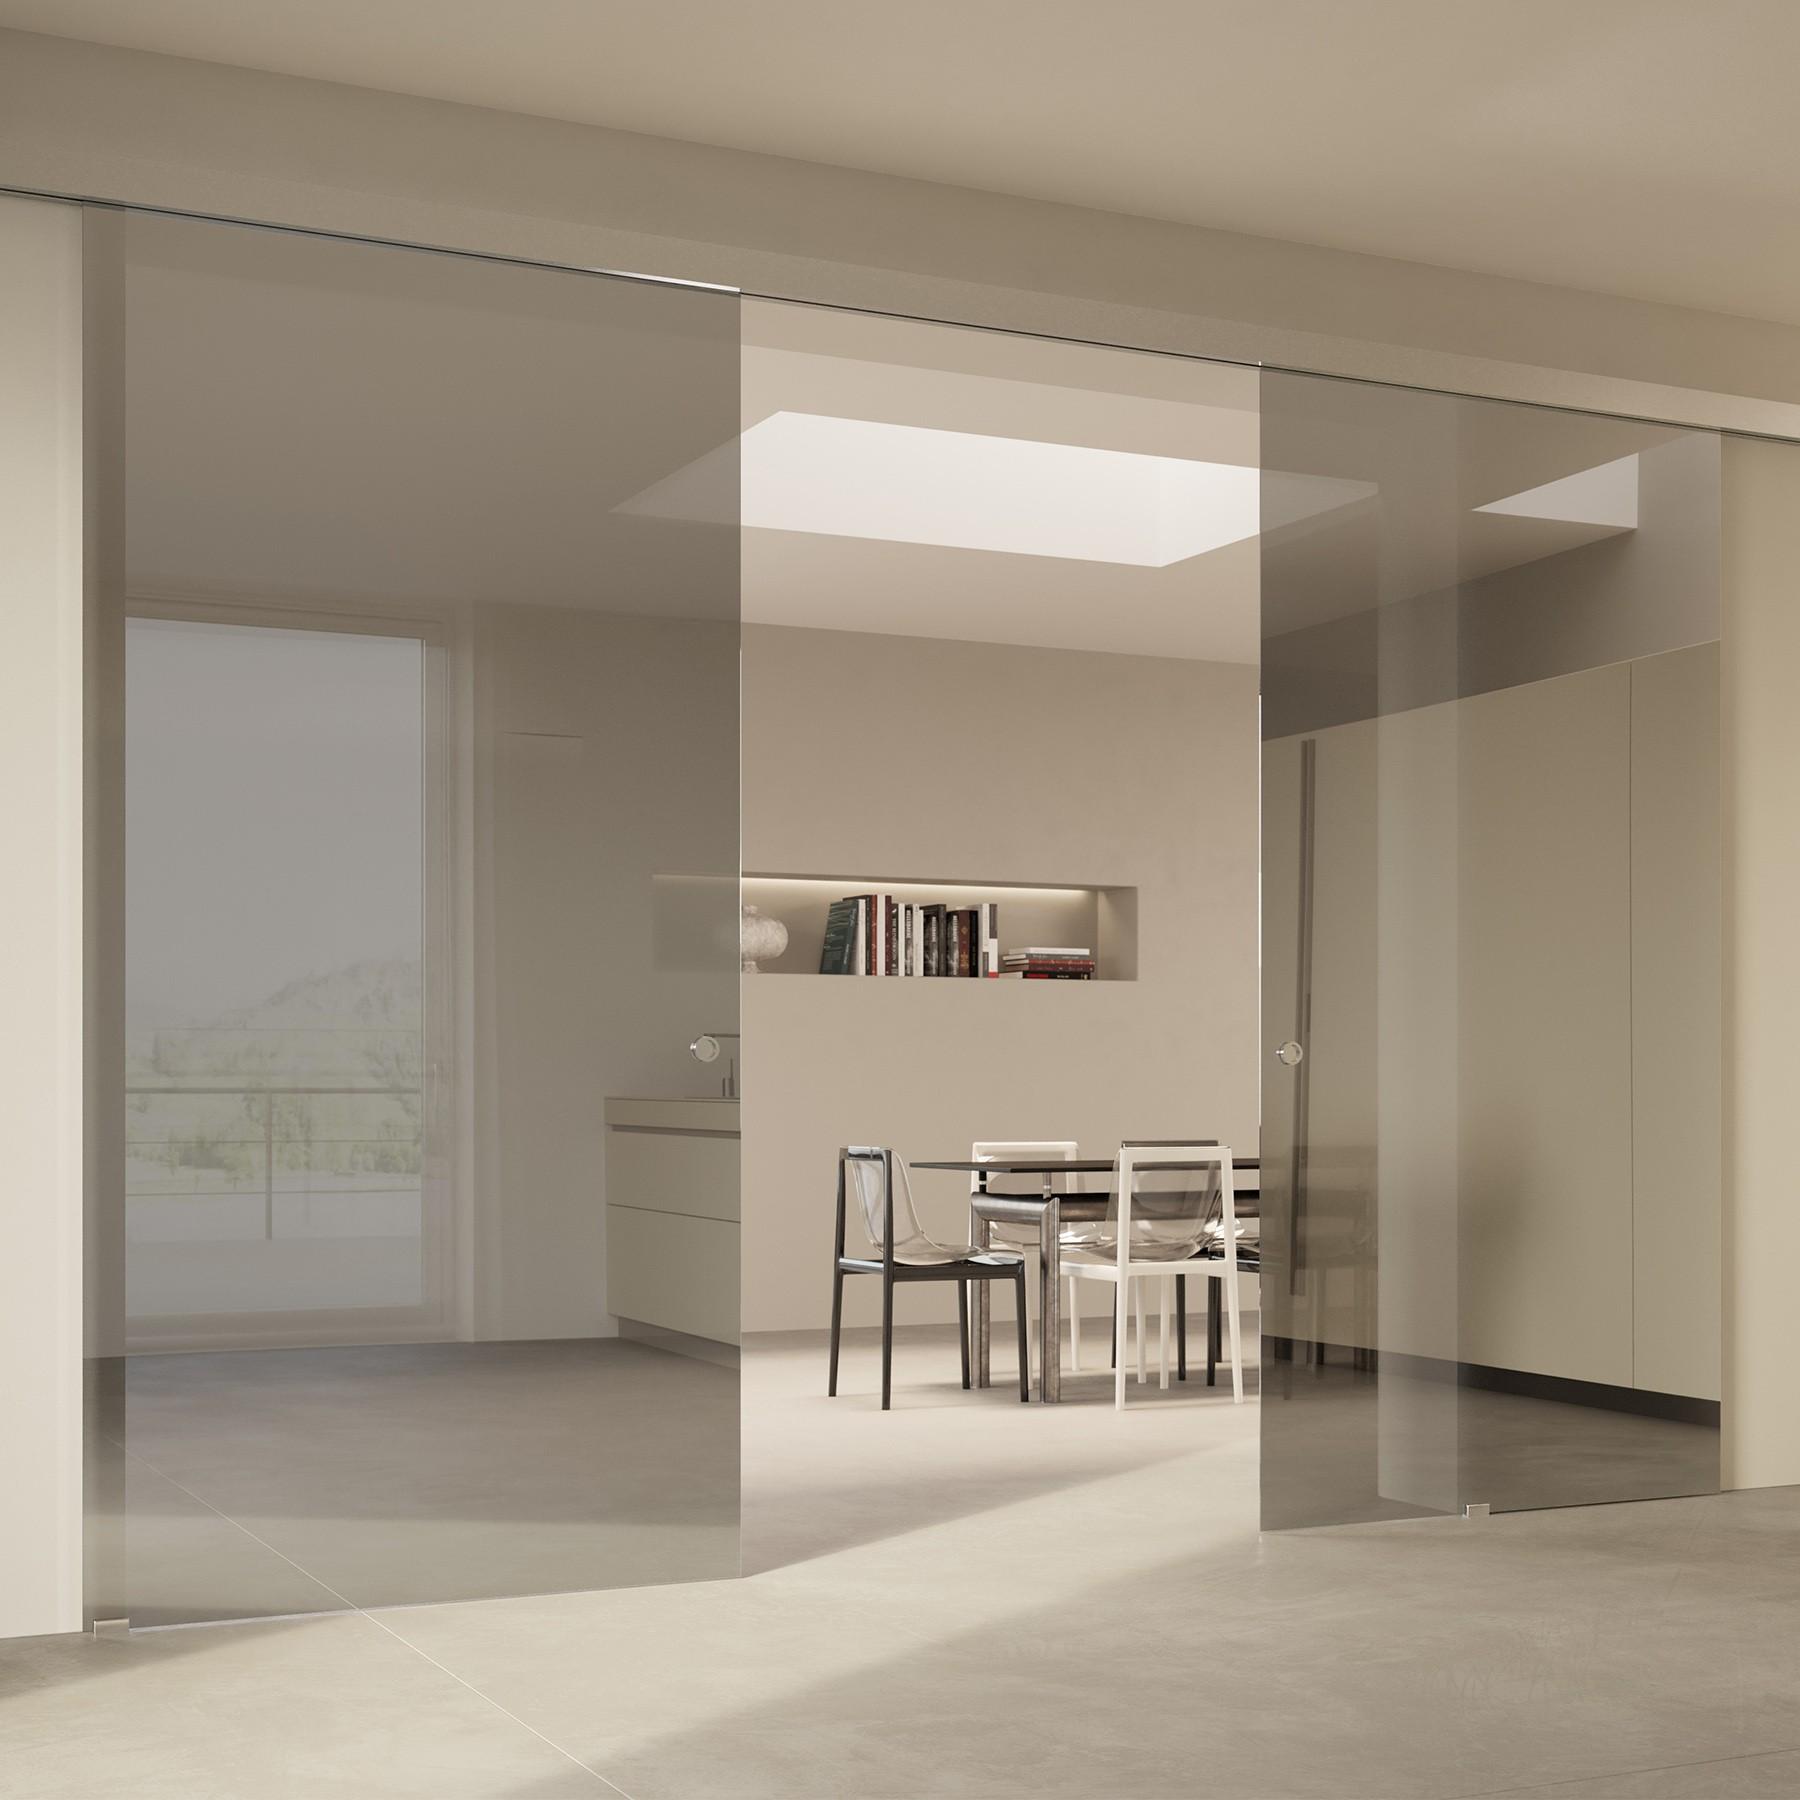 Scenario Visio with Reflecting grigio glass